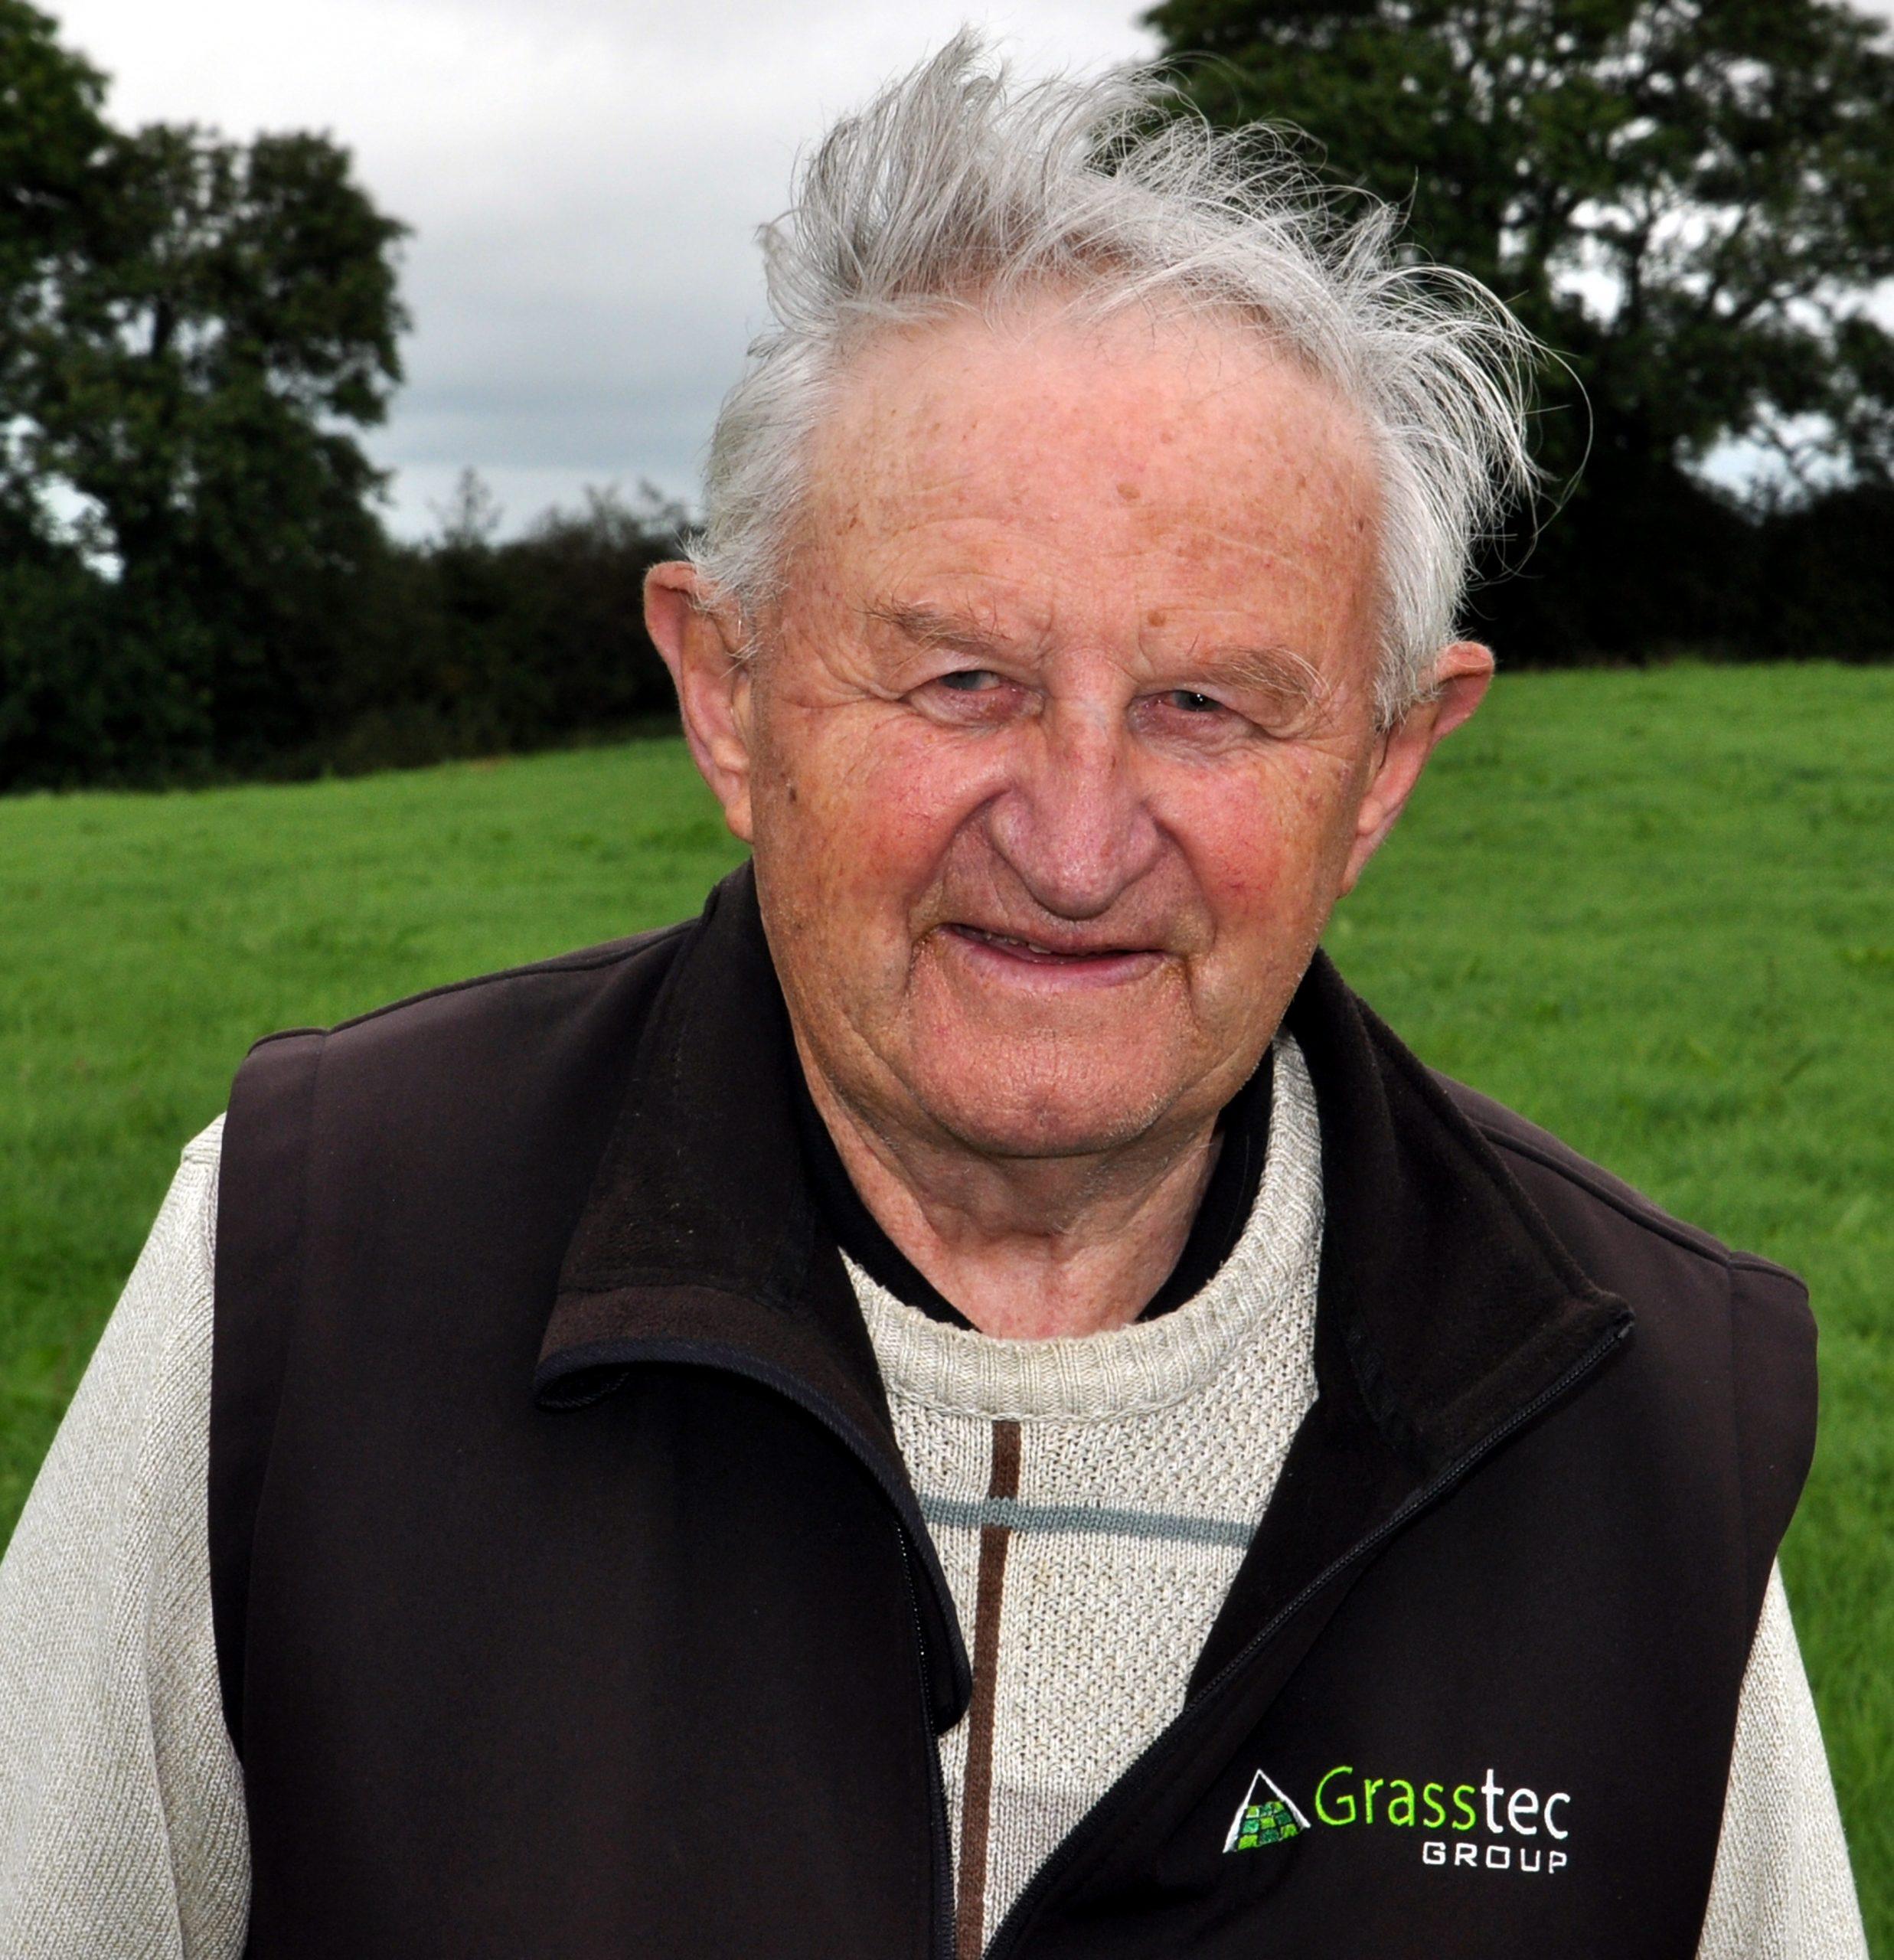 Norman Bateman Grasstec Livestock Department